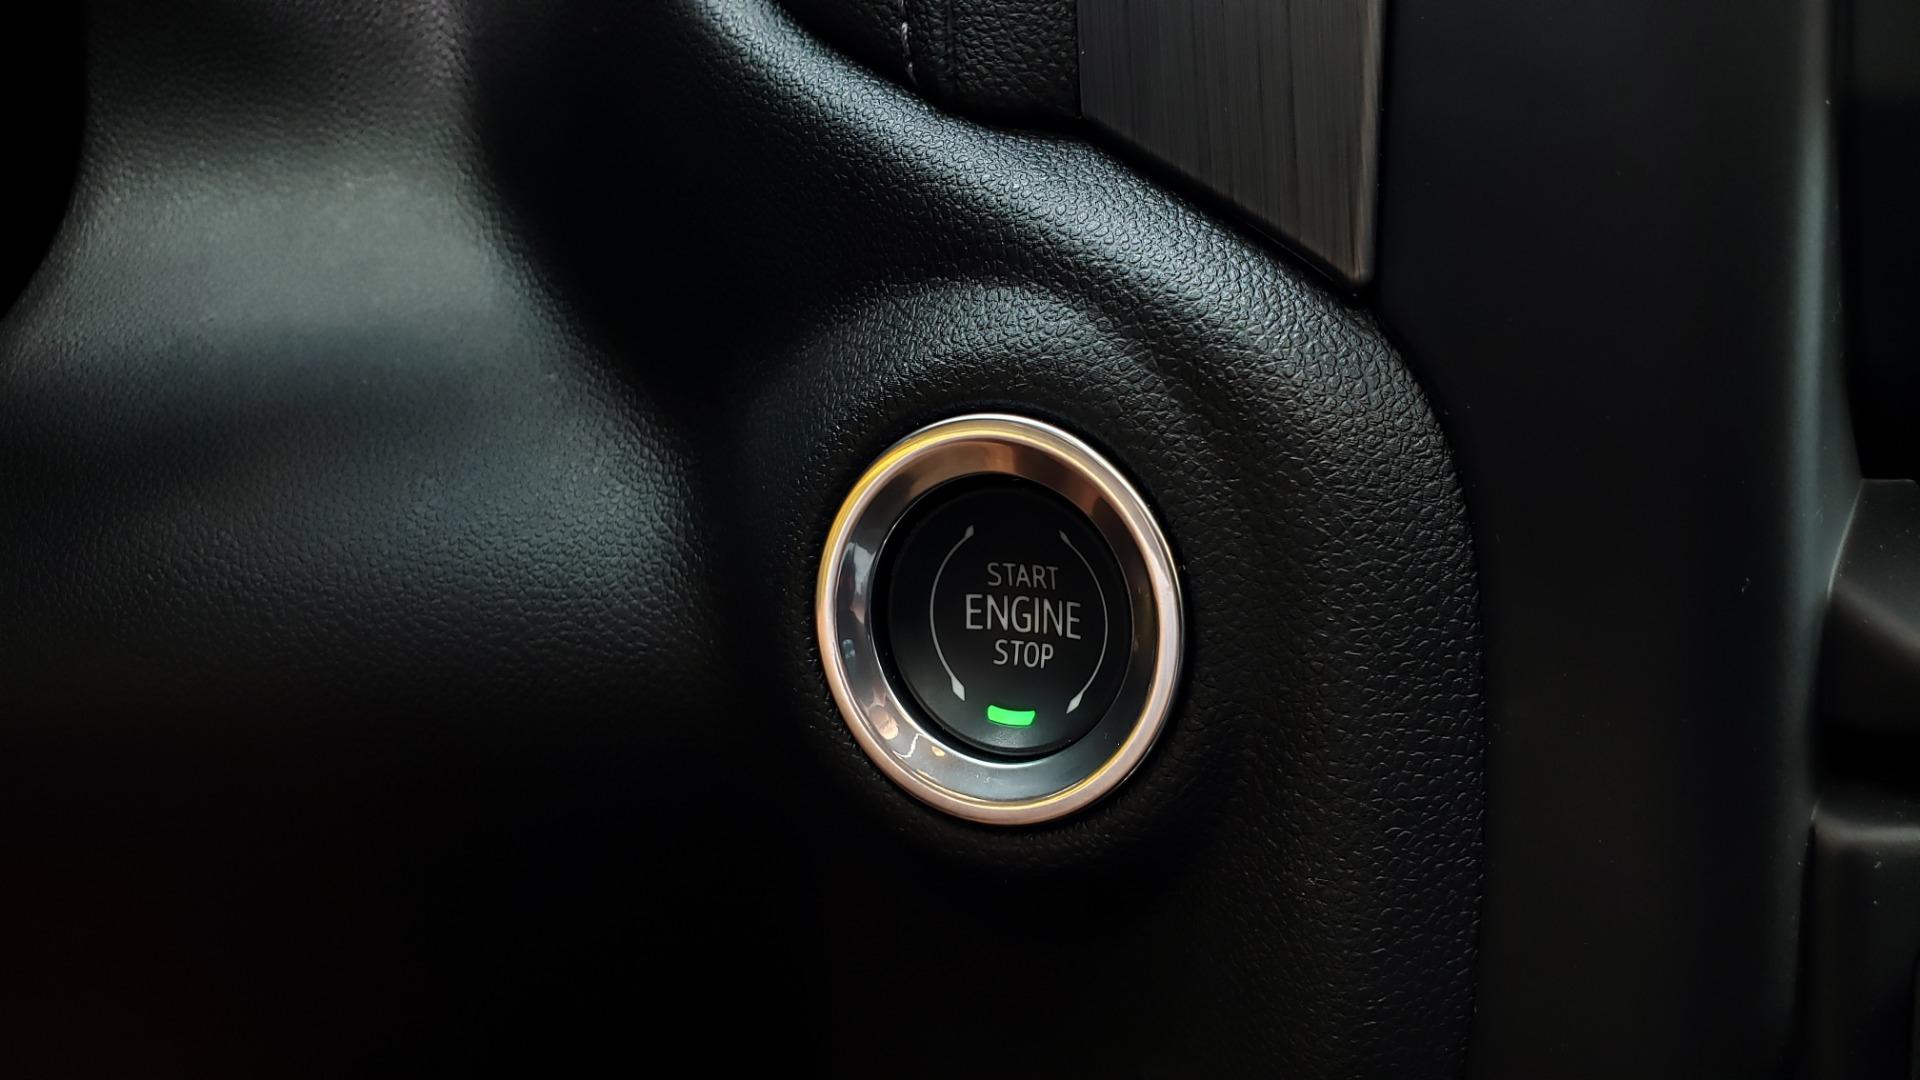 Used 2019 GMC SIERRA 1500 DENALI ULTIMATE 4WD / NAV / TECH PKG / DRVR ALRT for sale Sold at Formula Imports in Charlotte NC 28227 52